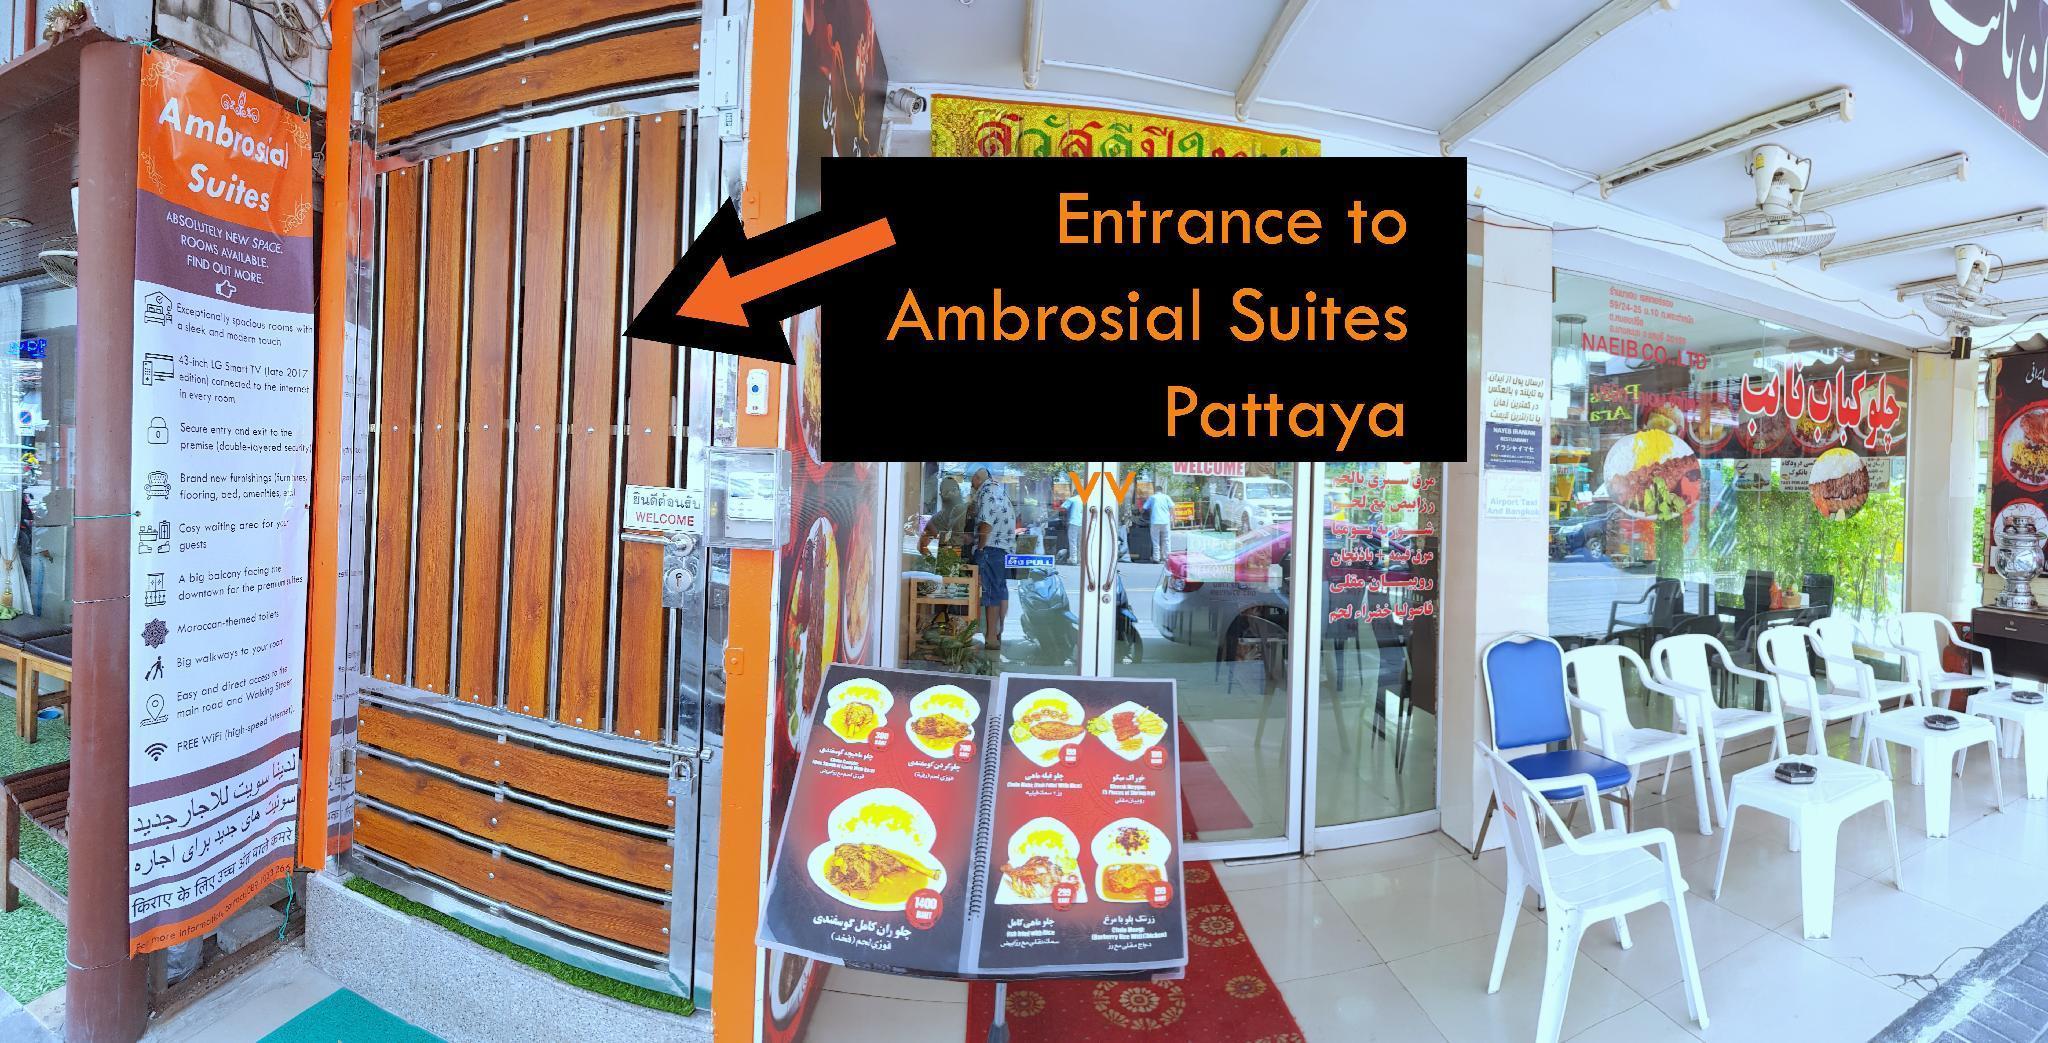 Ambrosial Suites Ambrosial Suites